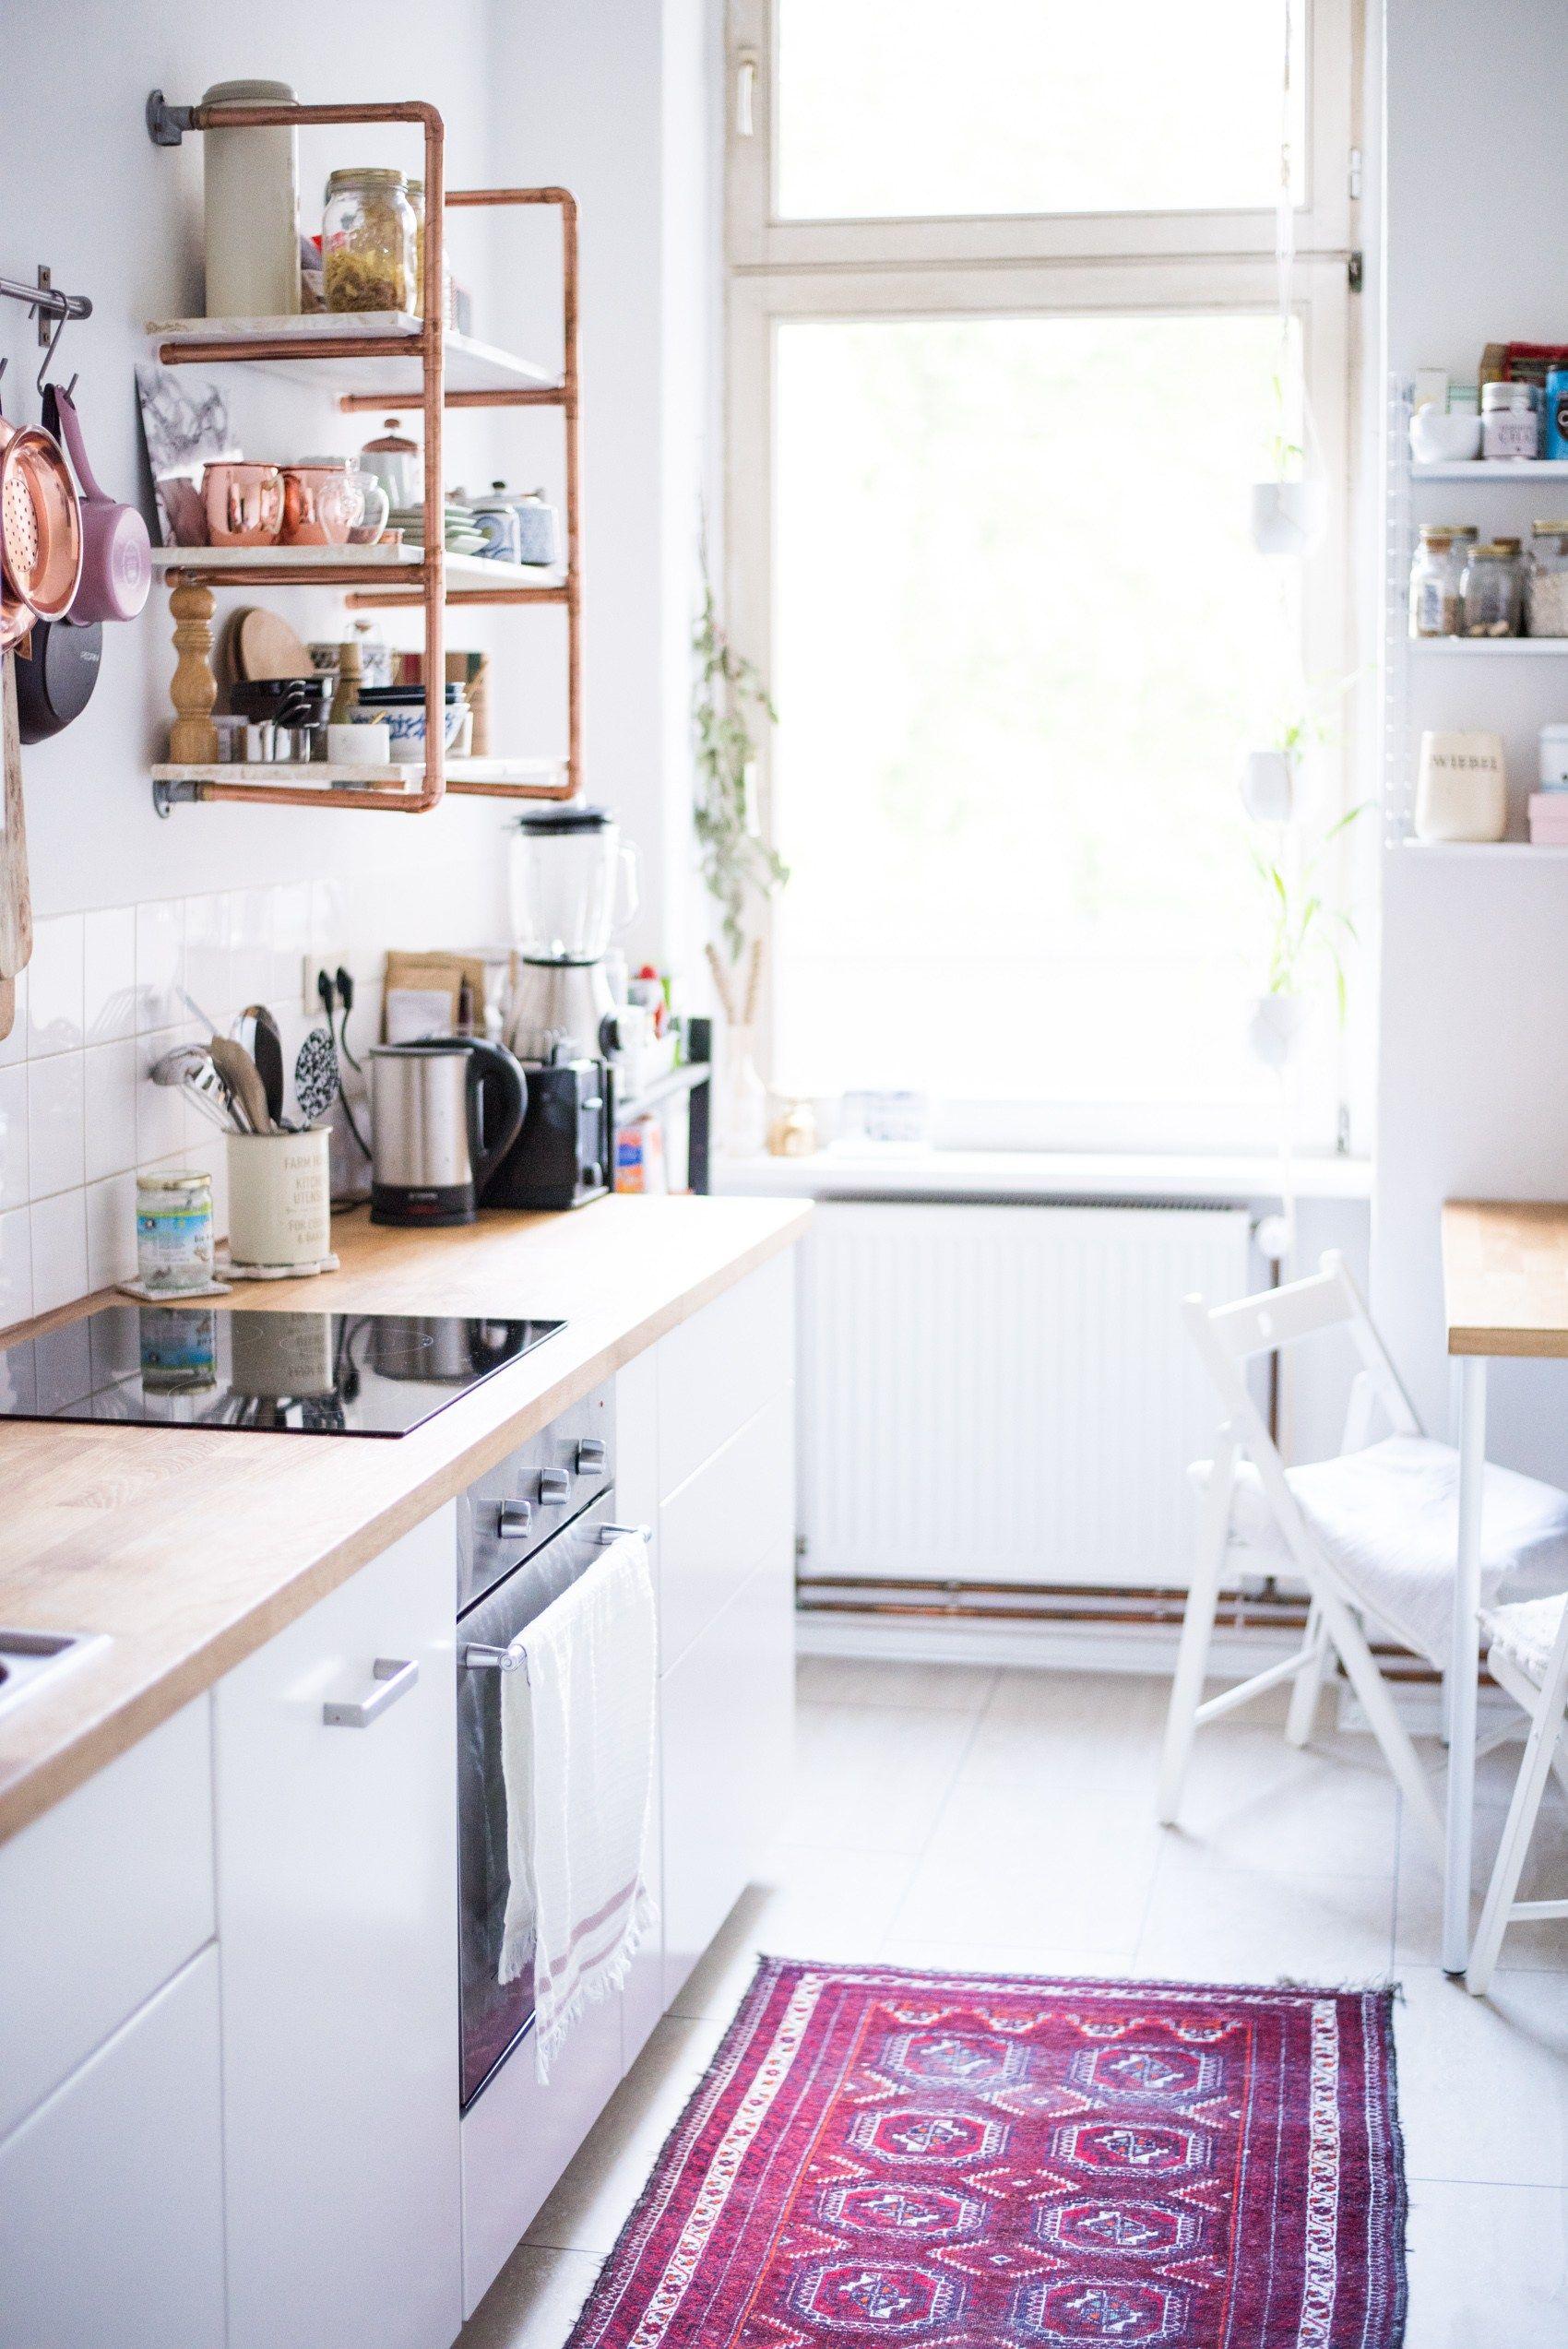 10 low budget interior tips for your kitchen | Küche, junges Leben ...